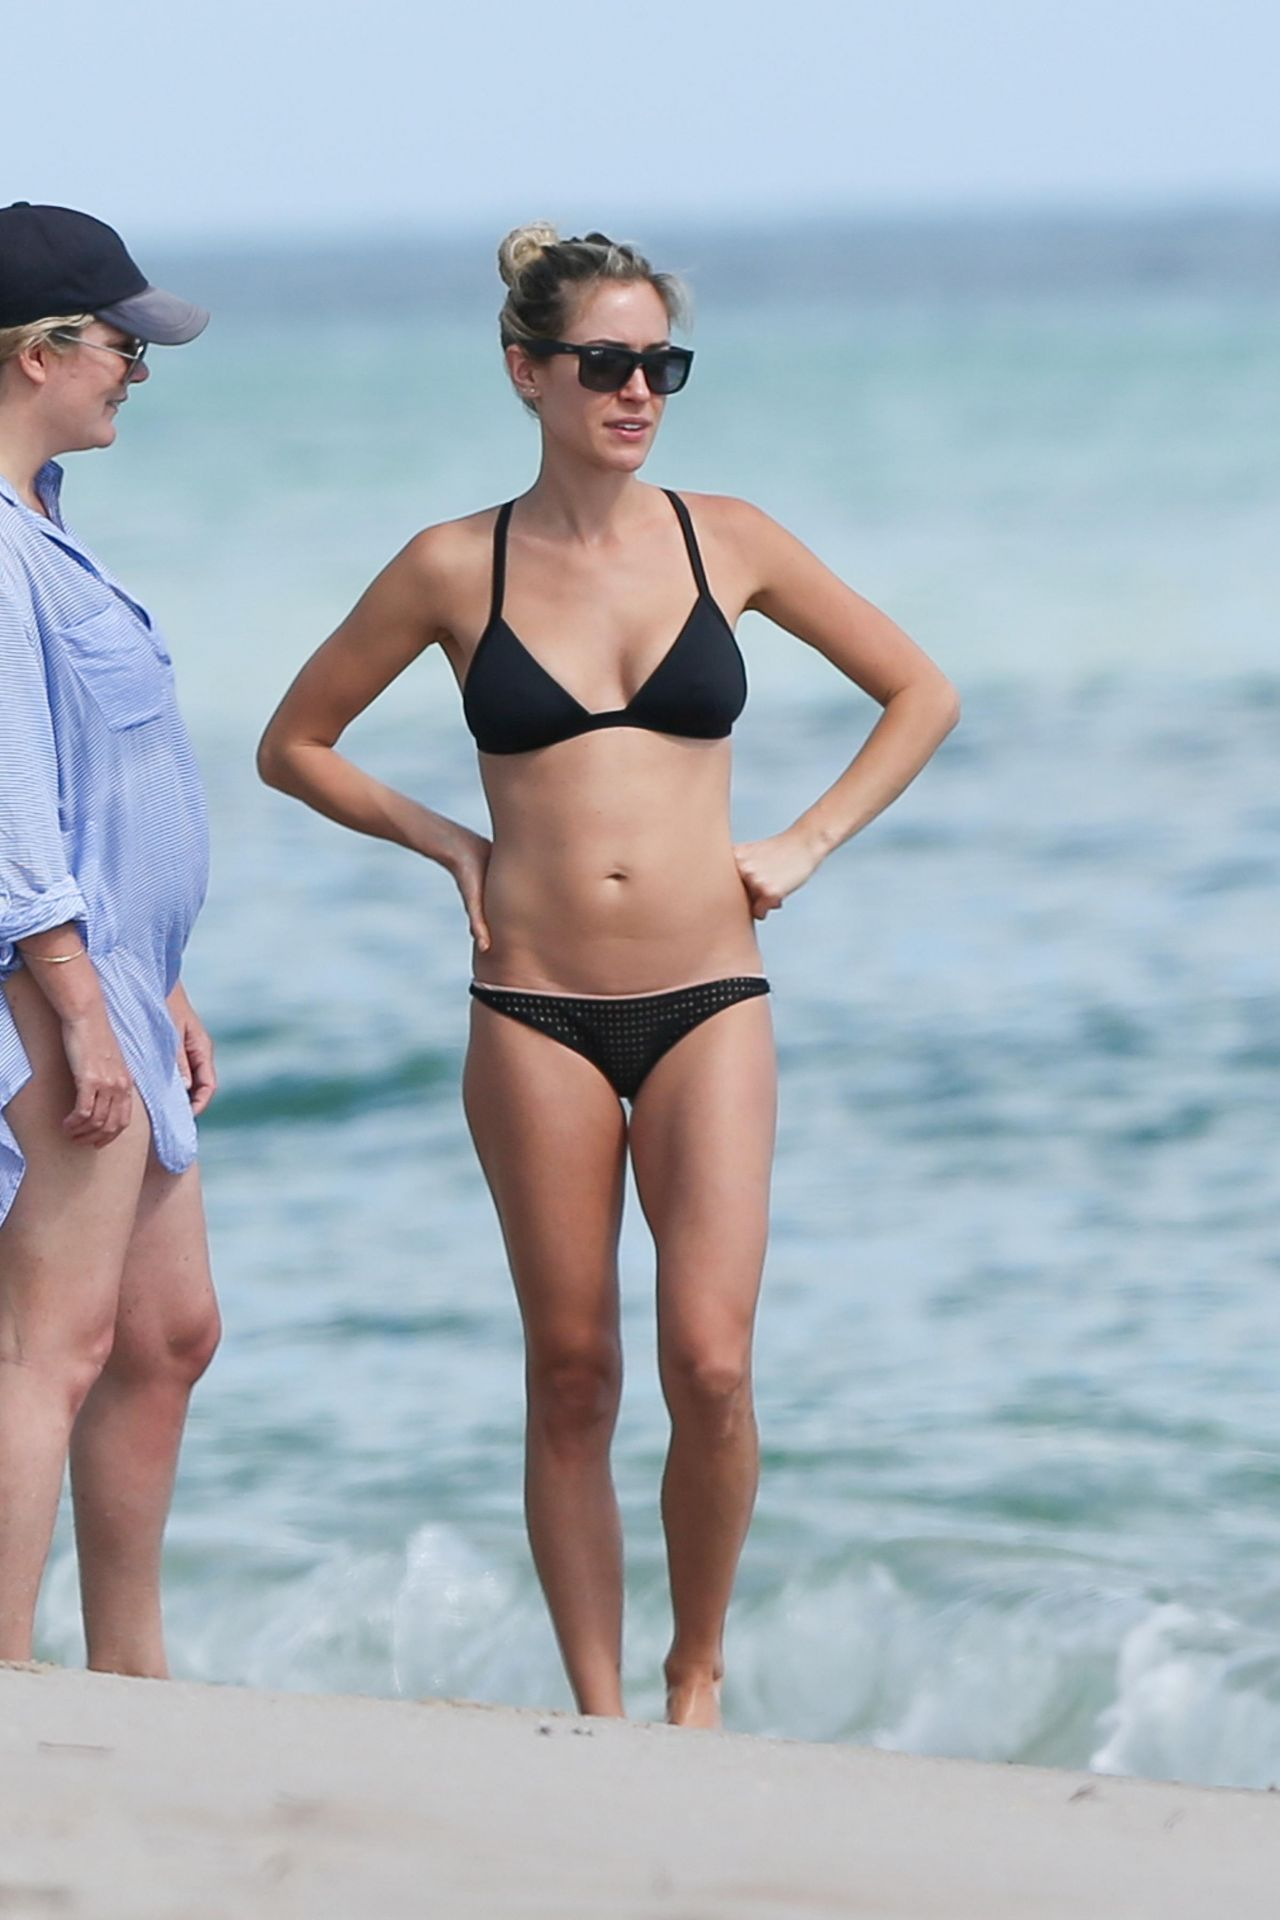 Bikini Kristin Cavallari nude (25 foto and video), Topless, Leaked, Instagram, butt 2017